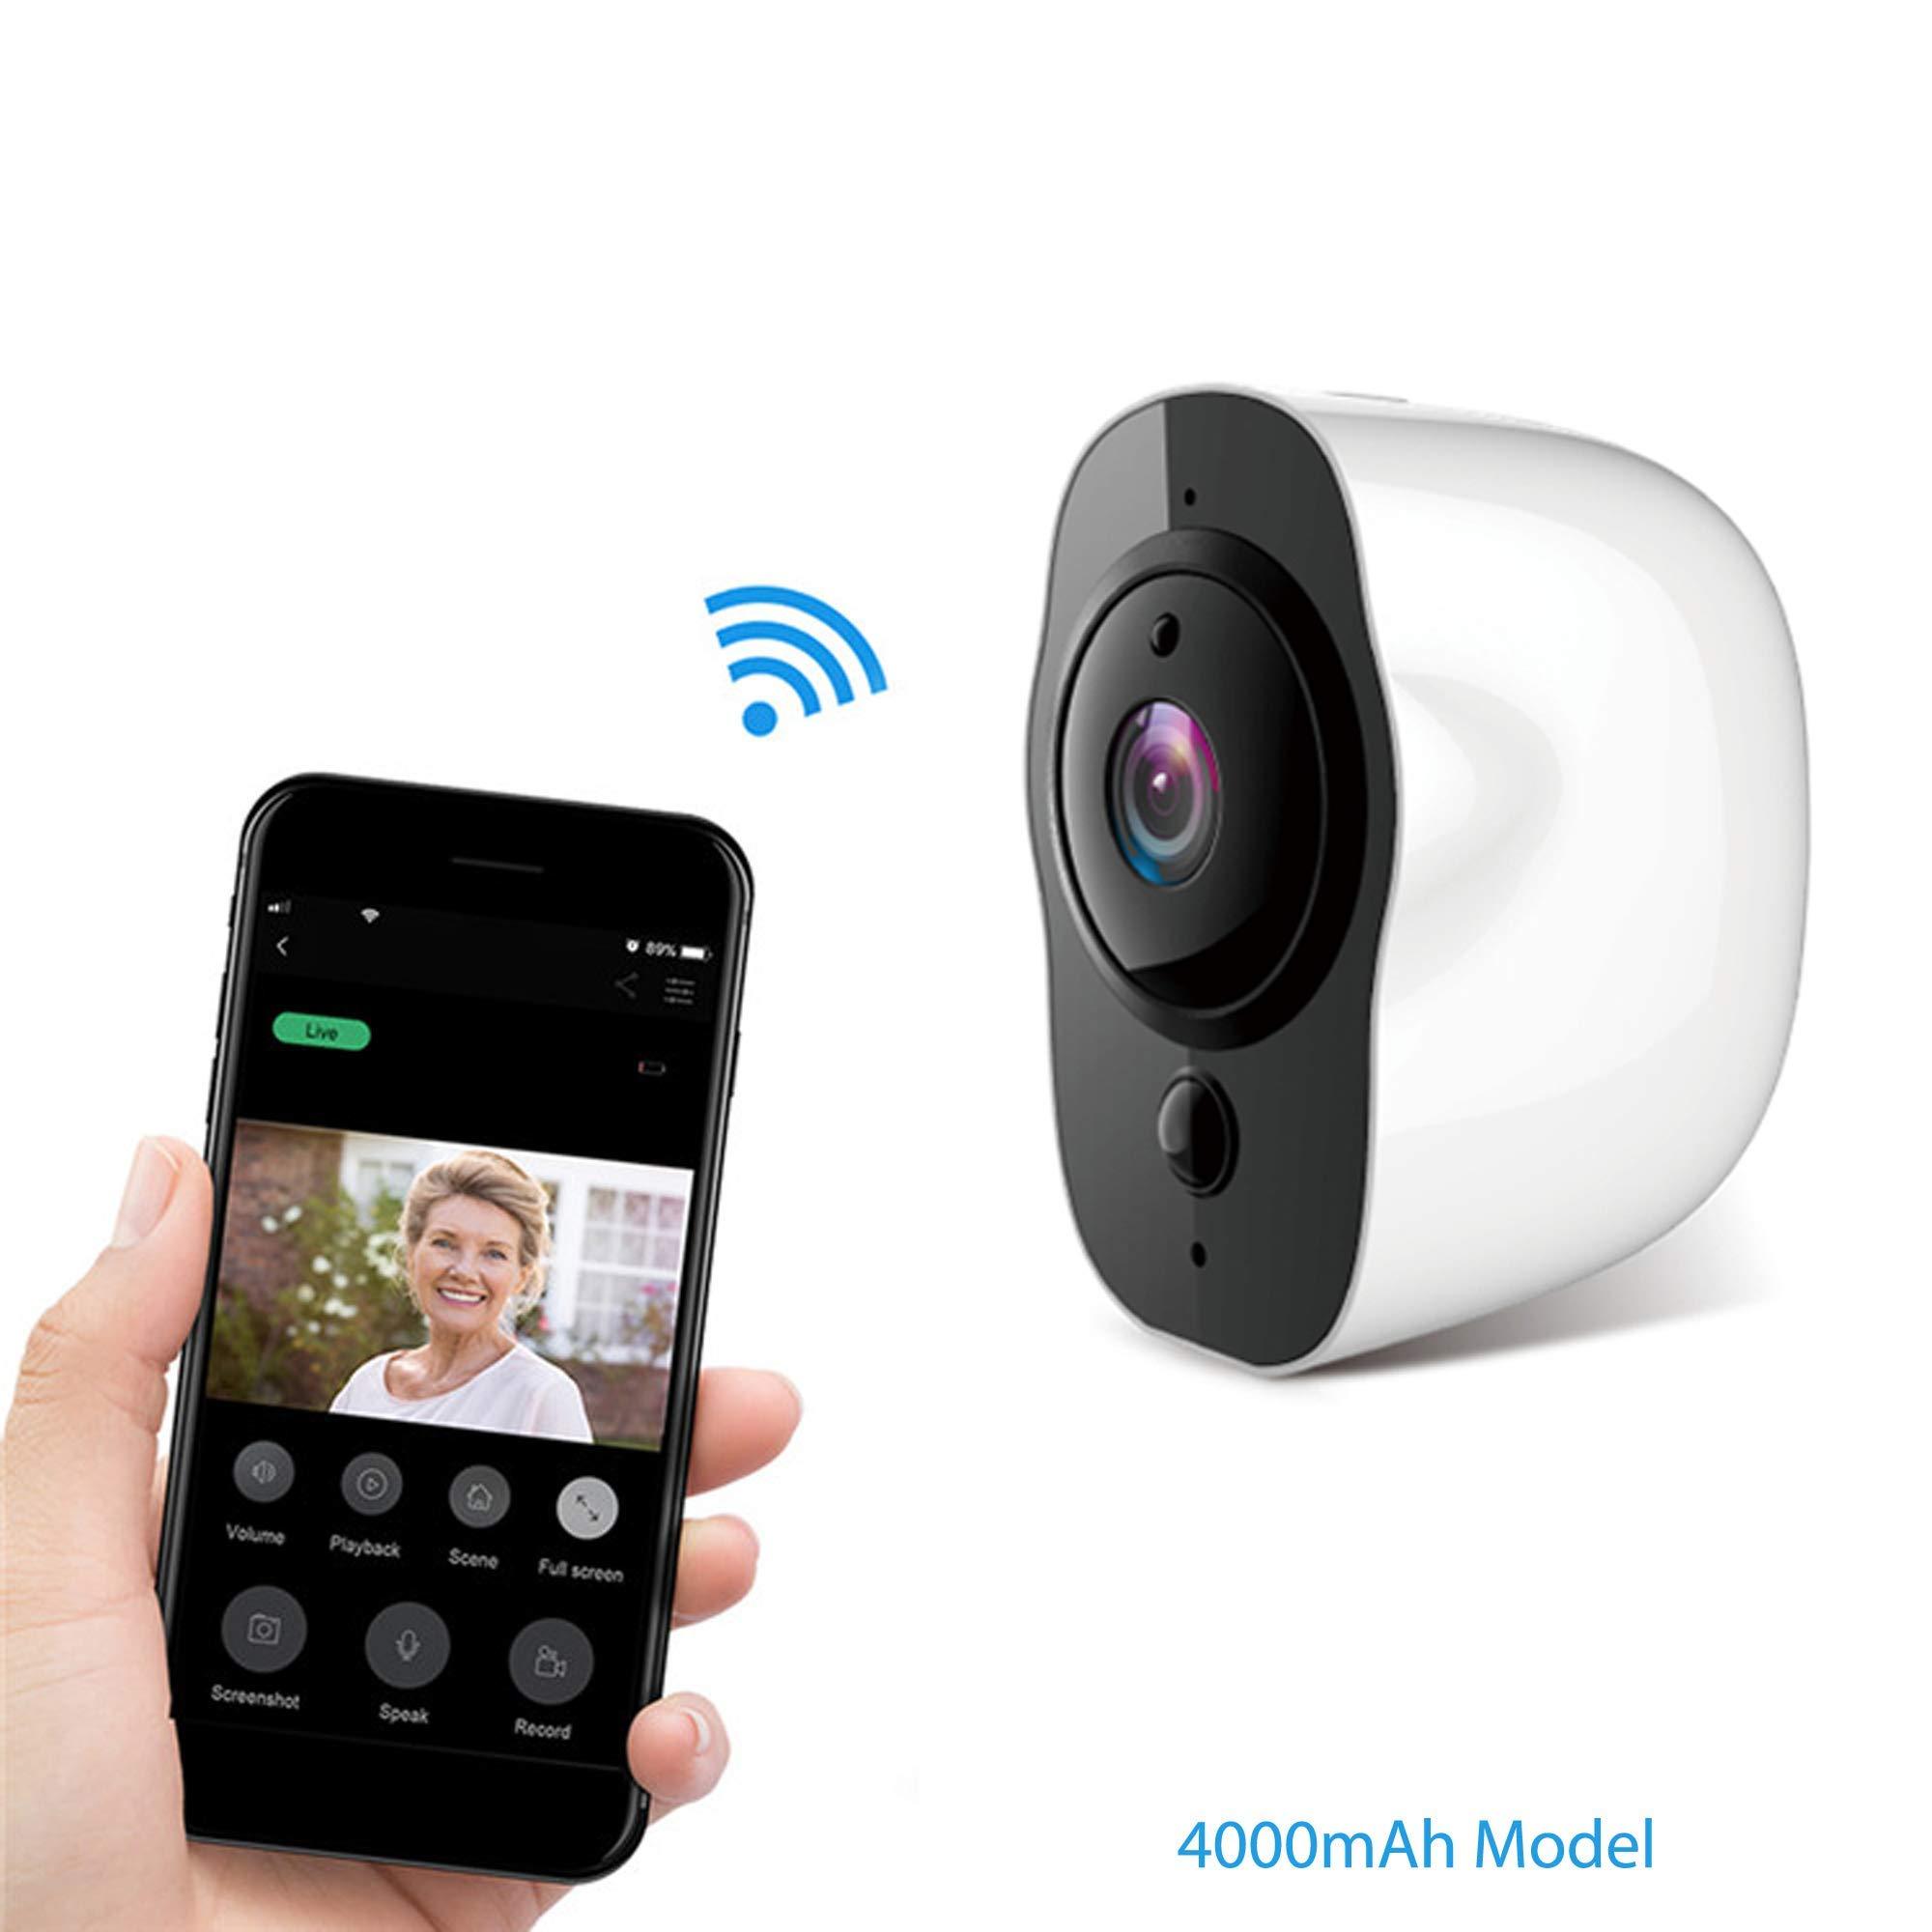 Zeus CCTV Outdoor 1080P WiFi Battery Powered Pod Camera Home Security Surveillance Mobile Smart Device (Low Power Consumption) by Zeus CCTV